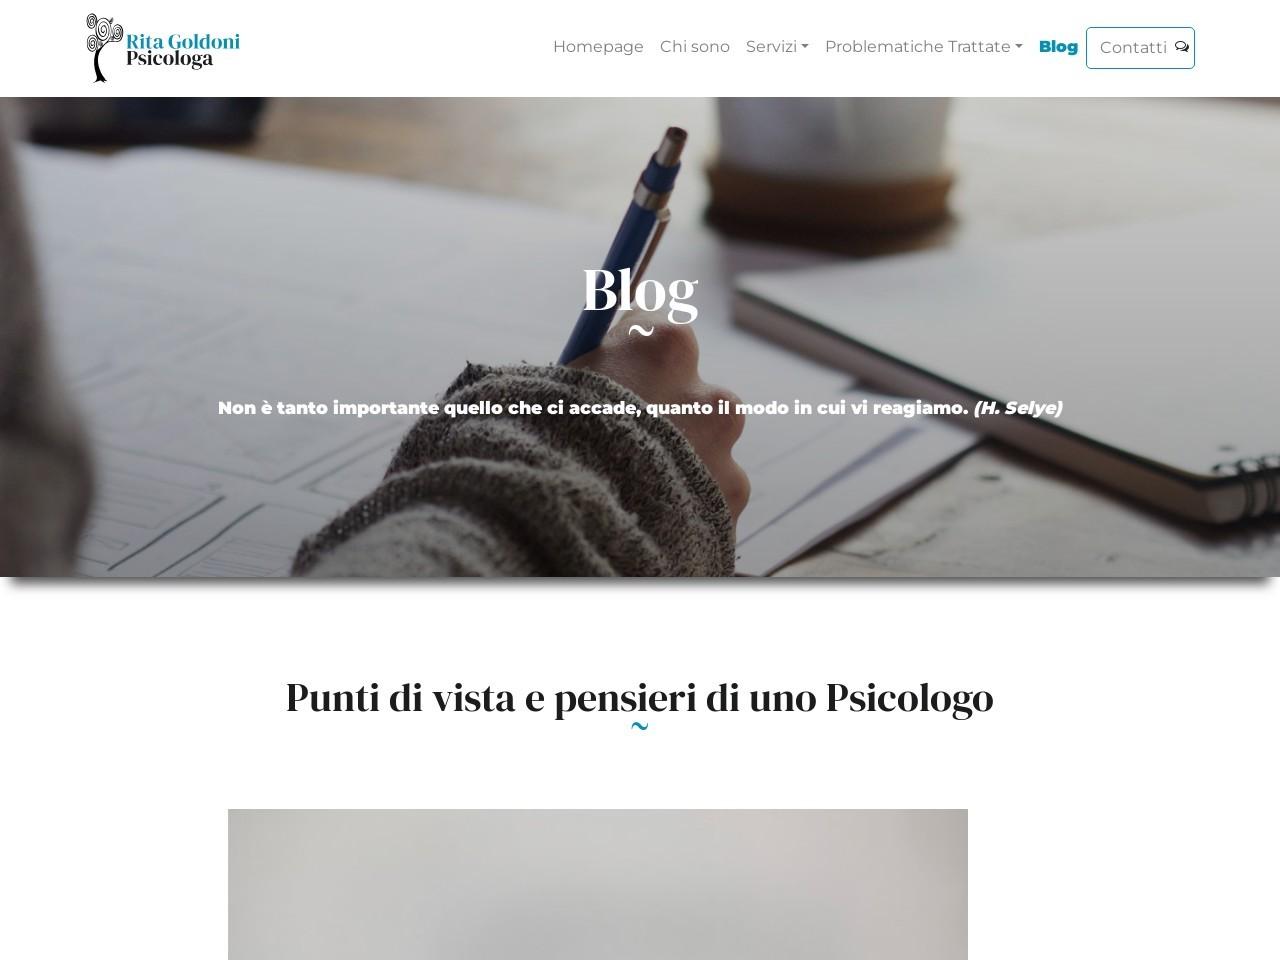 https-www-ritagoldoni-it-blog